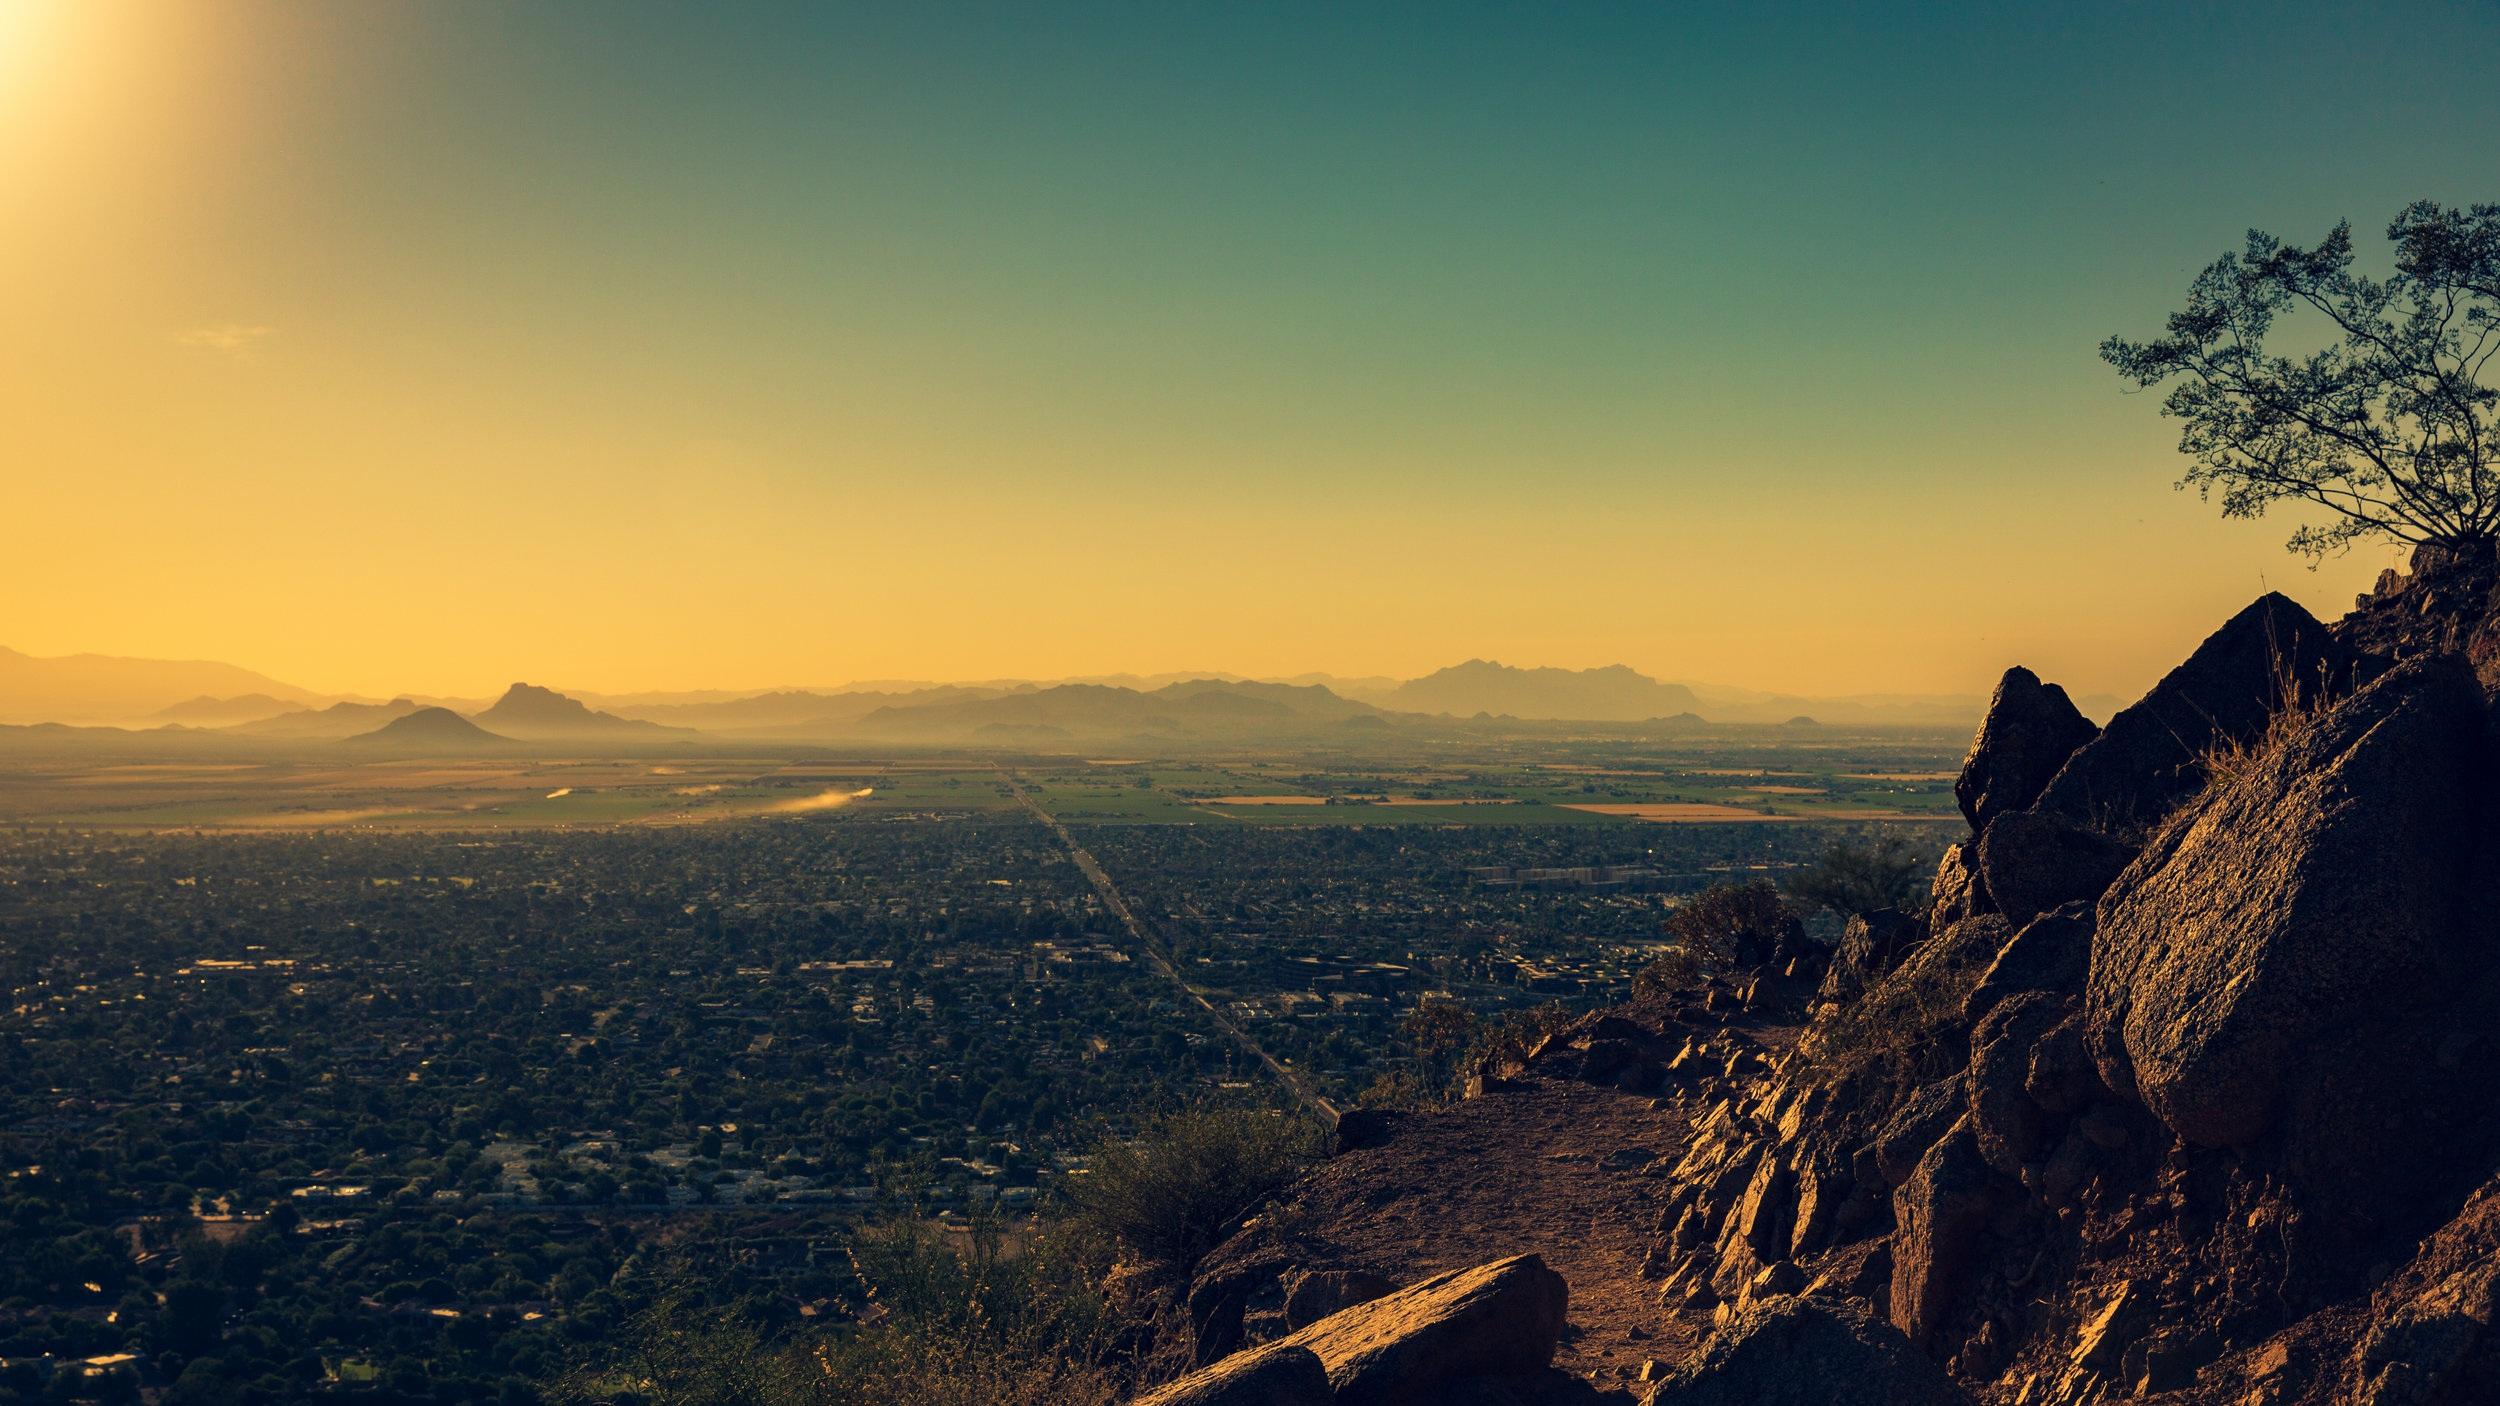 Phoenix - June 15-19, 2015   Chairs: Todd W. Vanderah (USA, Chair) / Jose Moron-Concepcion (USA, Co-Chair)  Young Investigator Award:  Dr Gregory Scherrer   Founders' Award:  Pr Gavril Pasternak